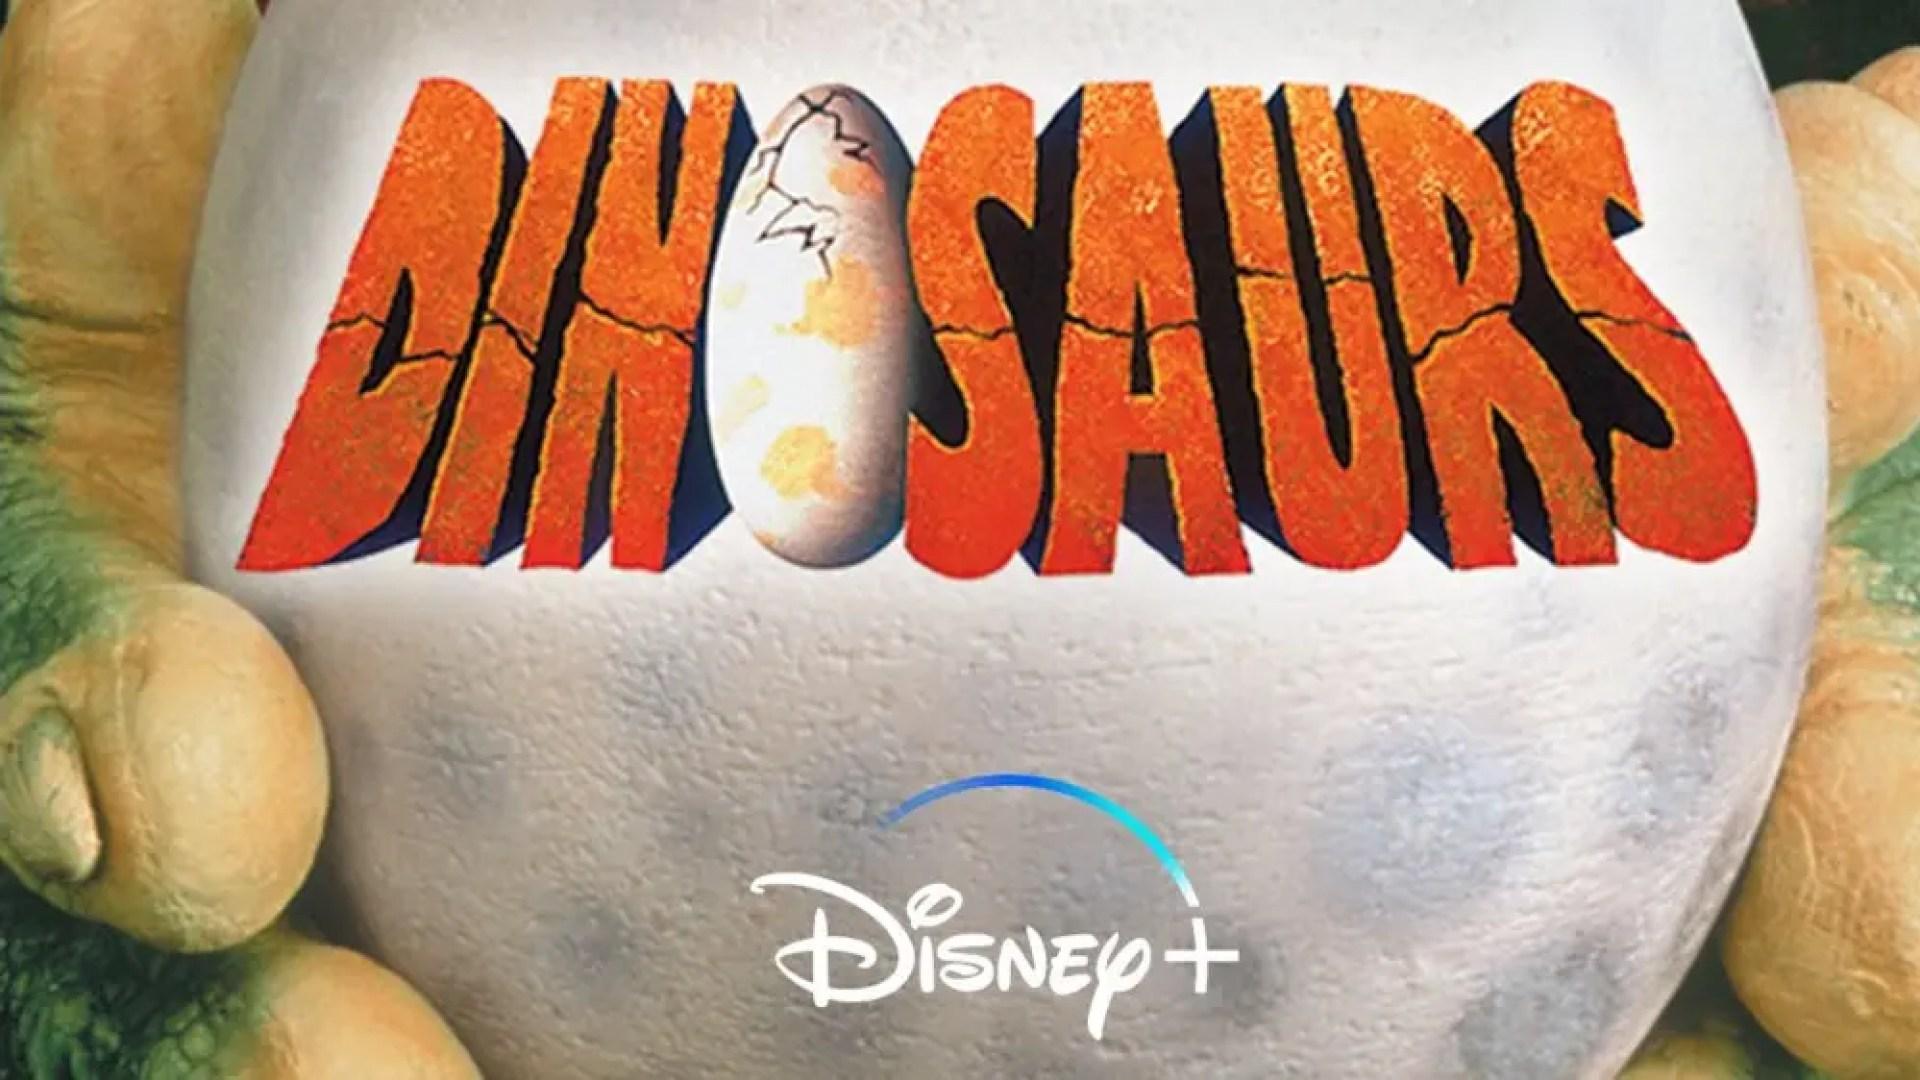 Dinosaurs TV show logo above Disney+ logo on Dinosaurs poster